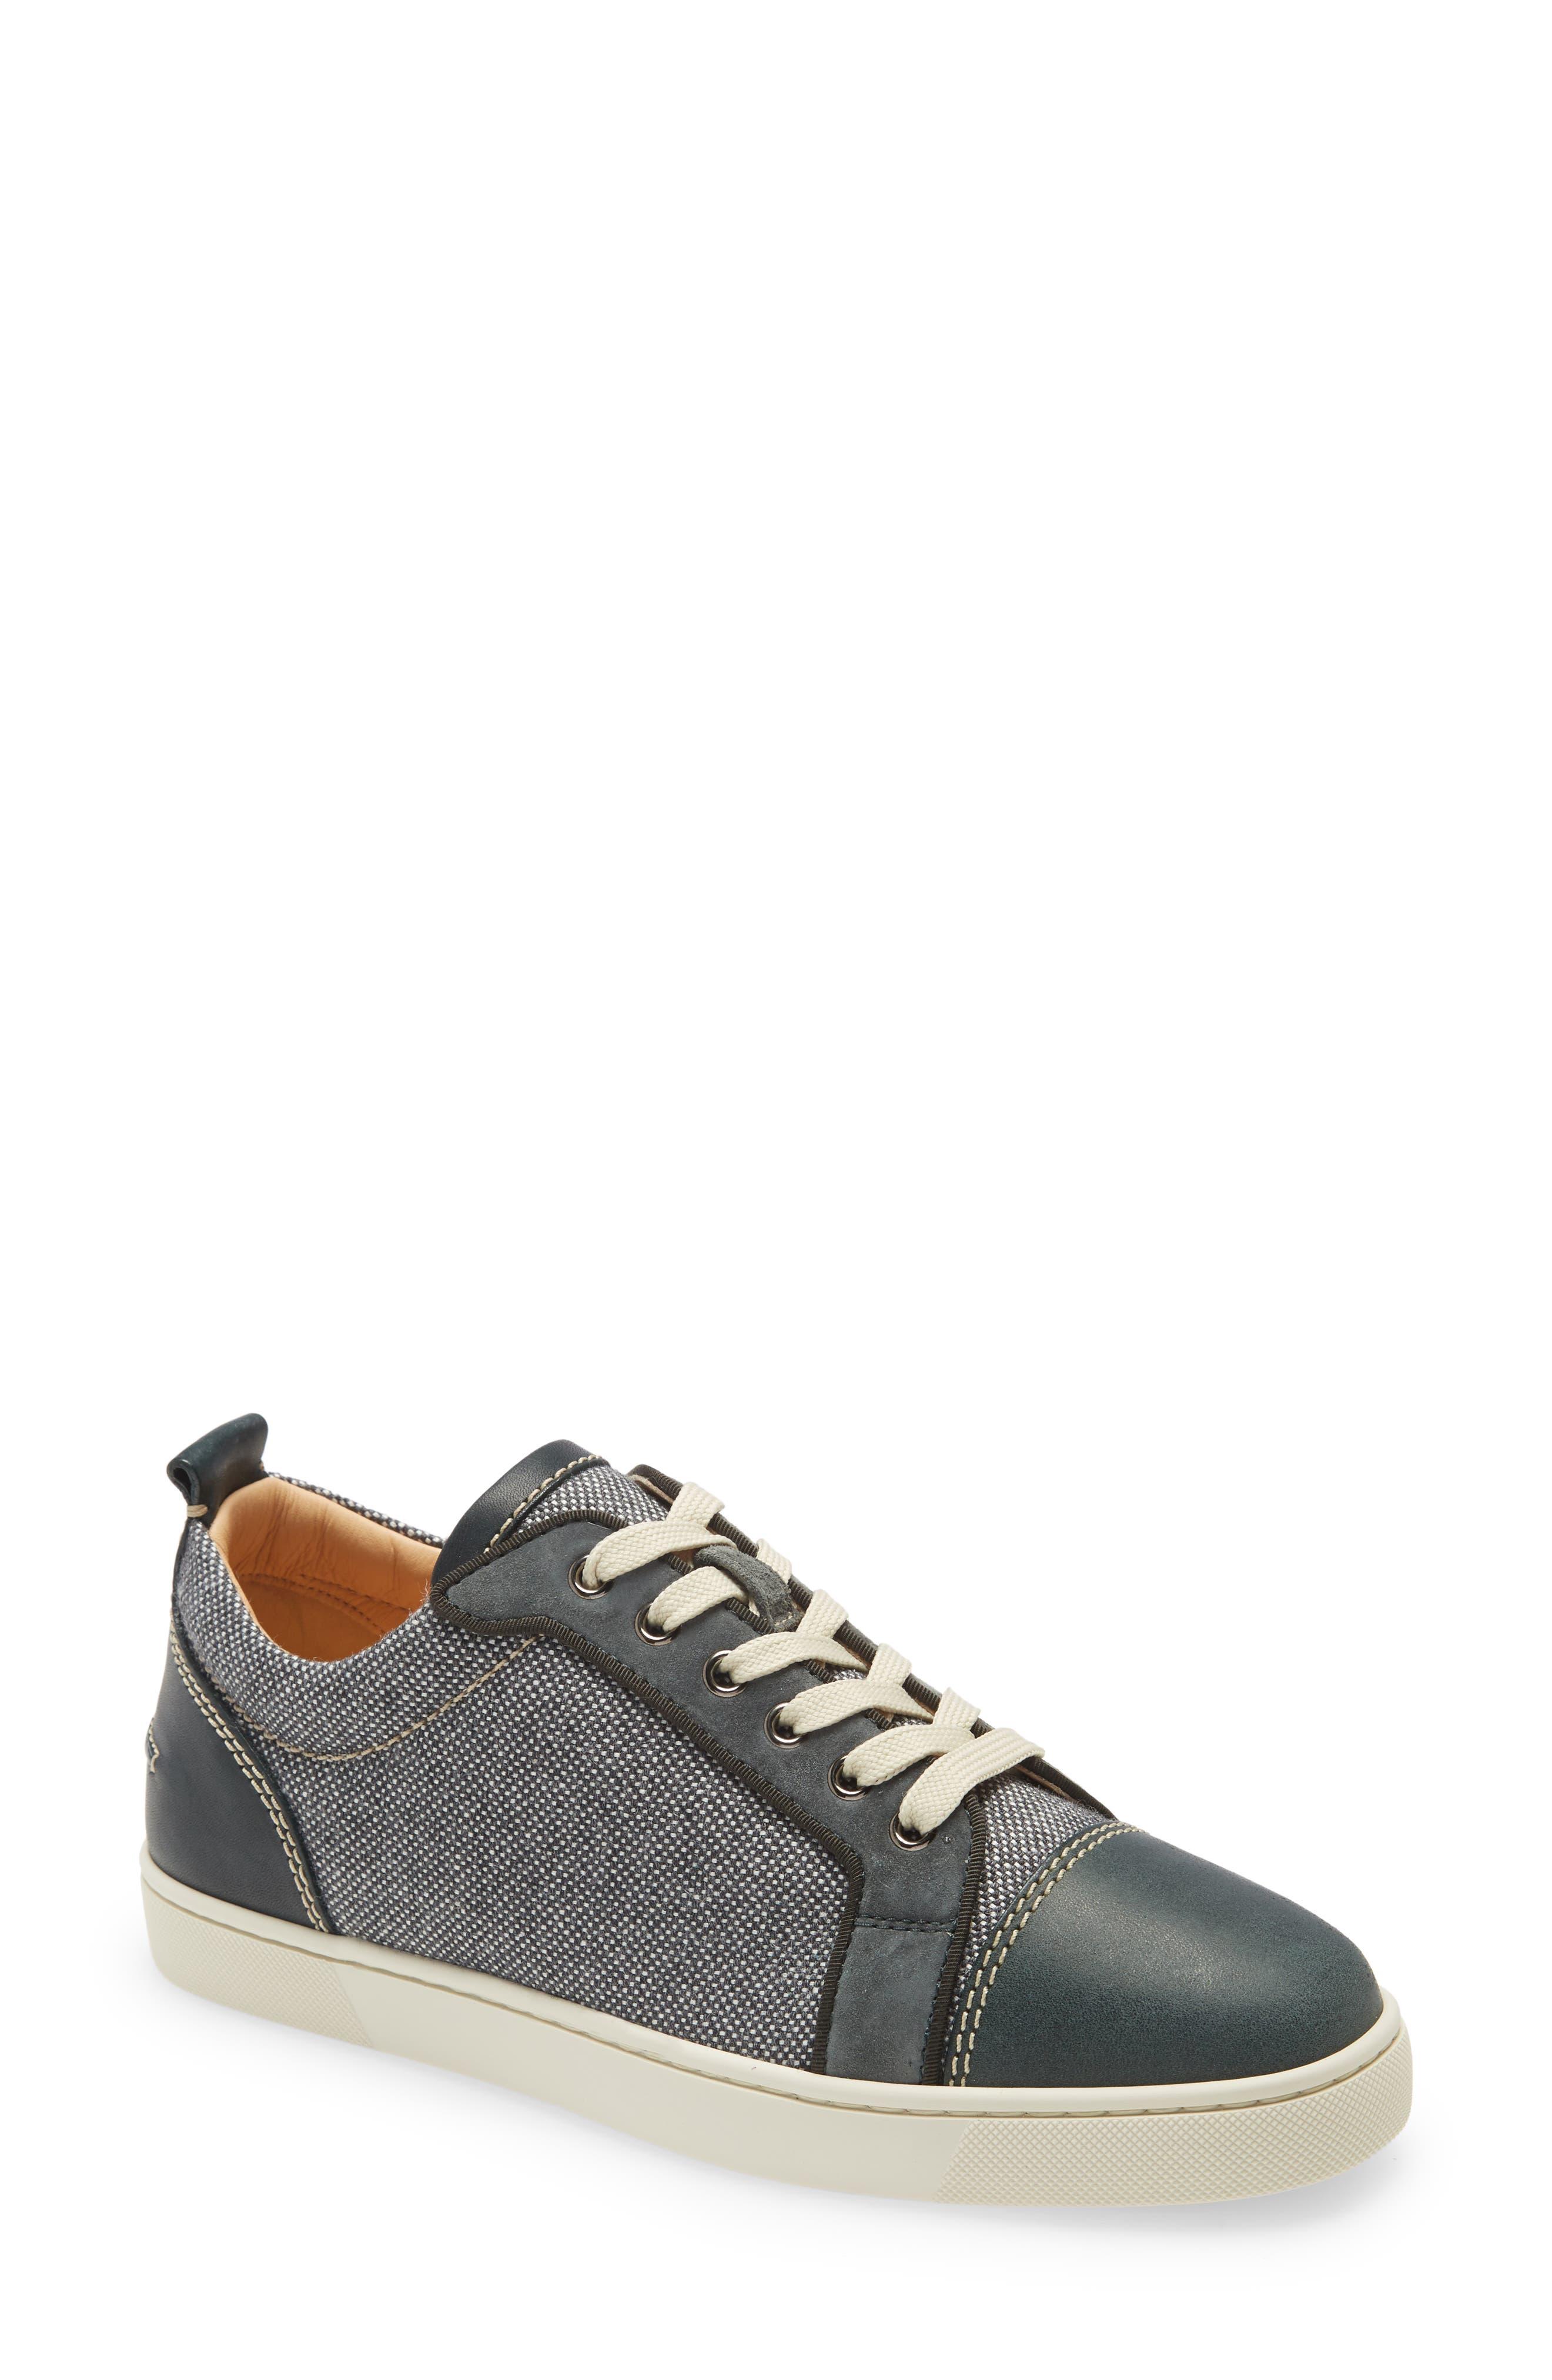 Men's Christian Louboutin Shoes   Nordstrom